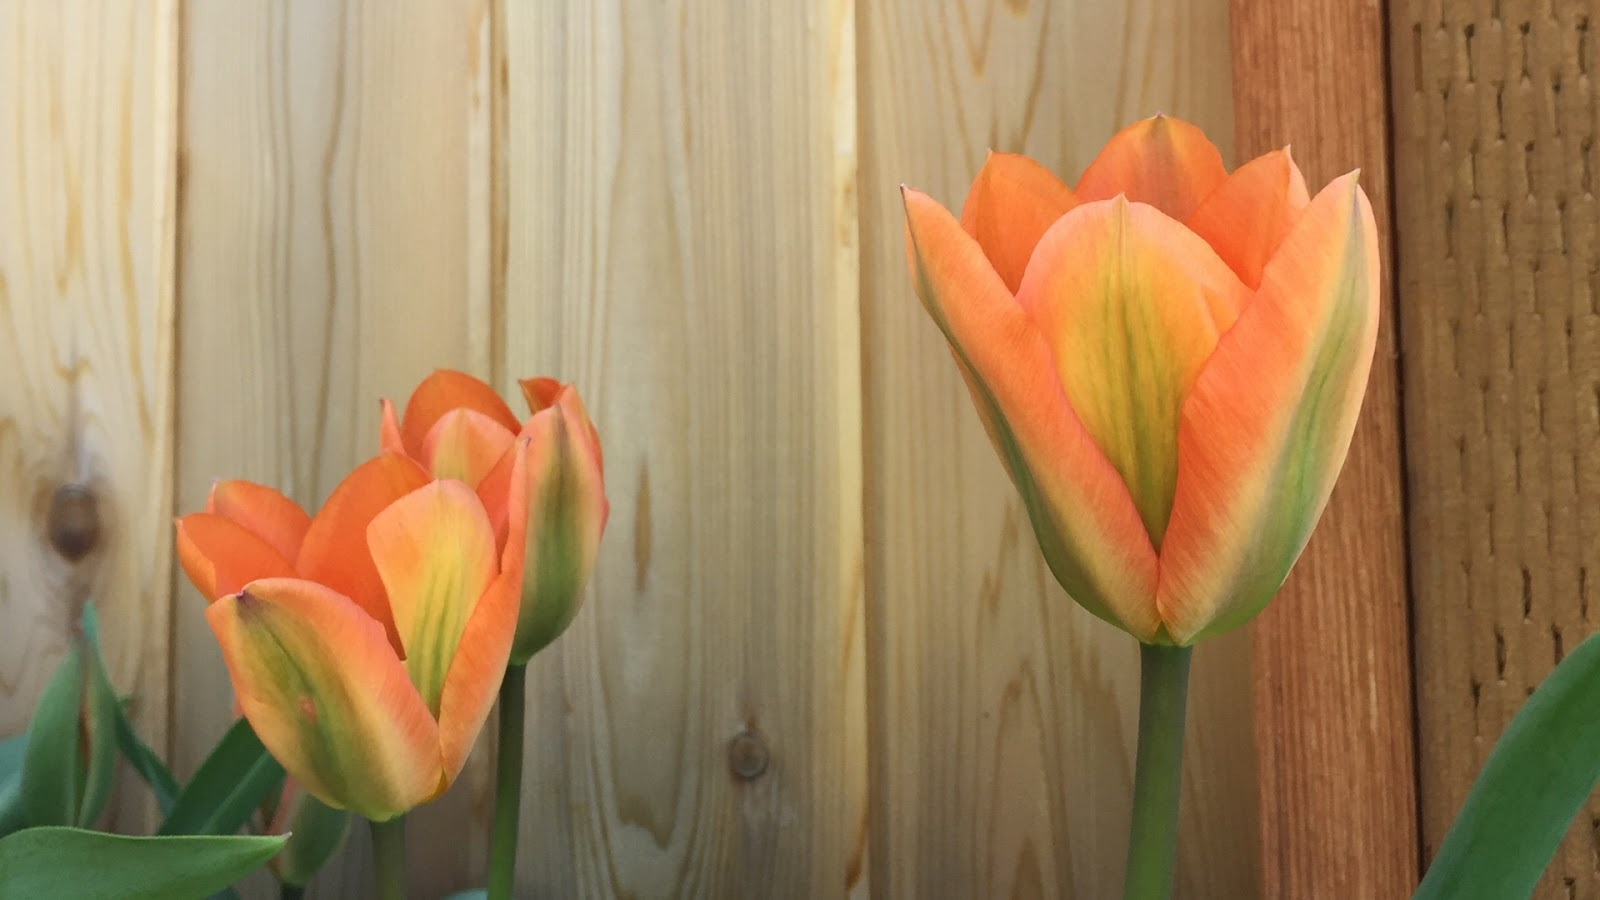 Tulips // April Desktop Wallpaper Download // www.thejoyblog.net